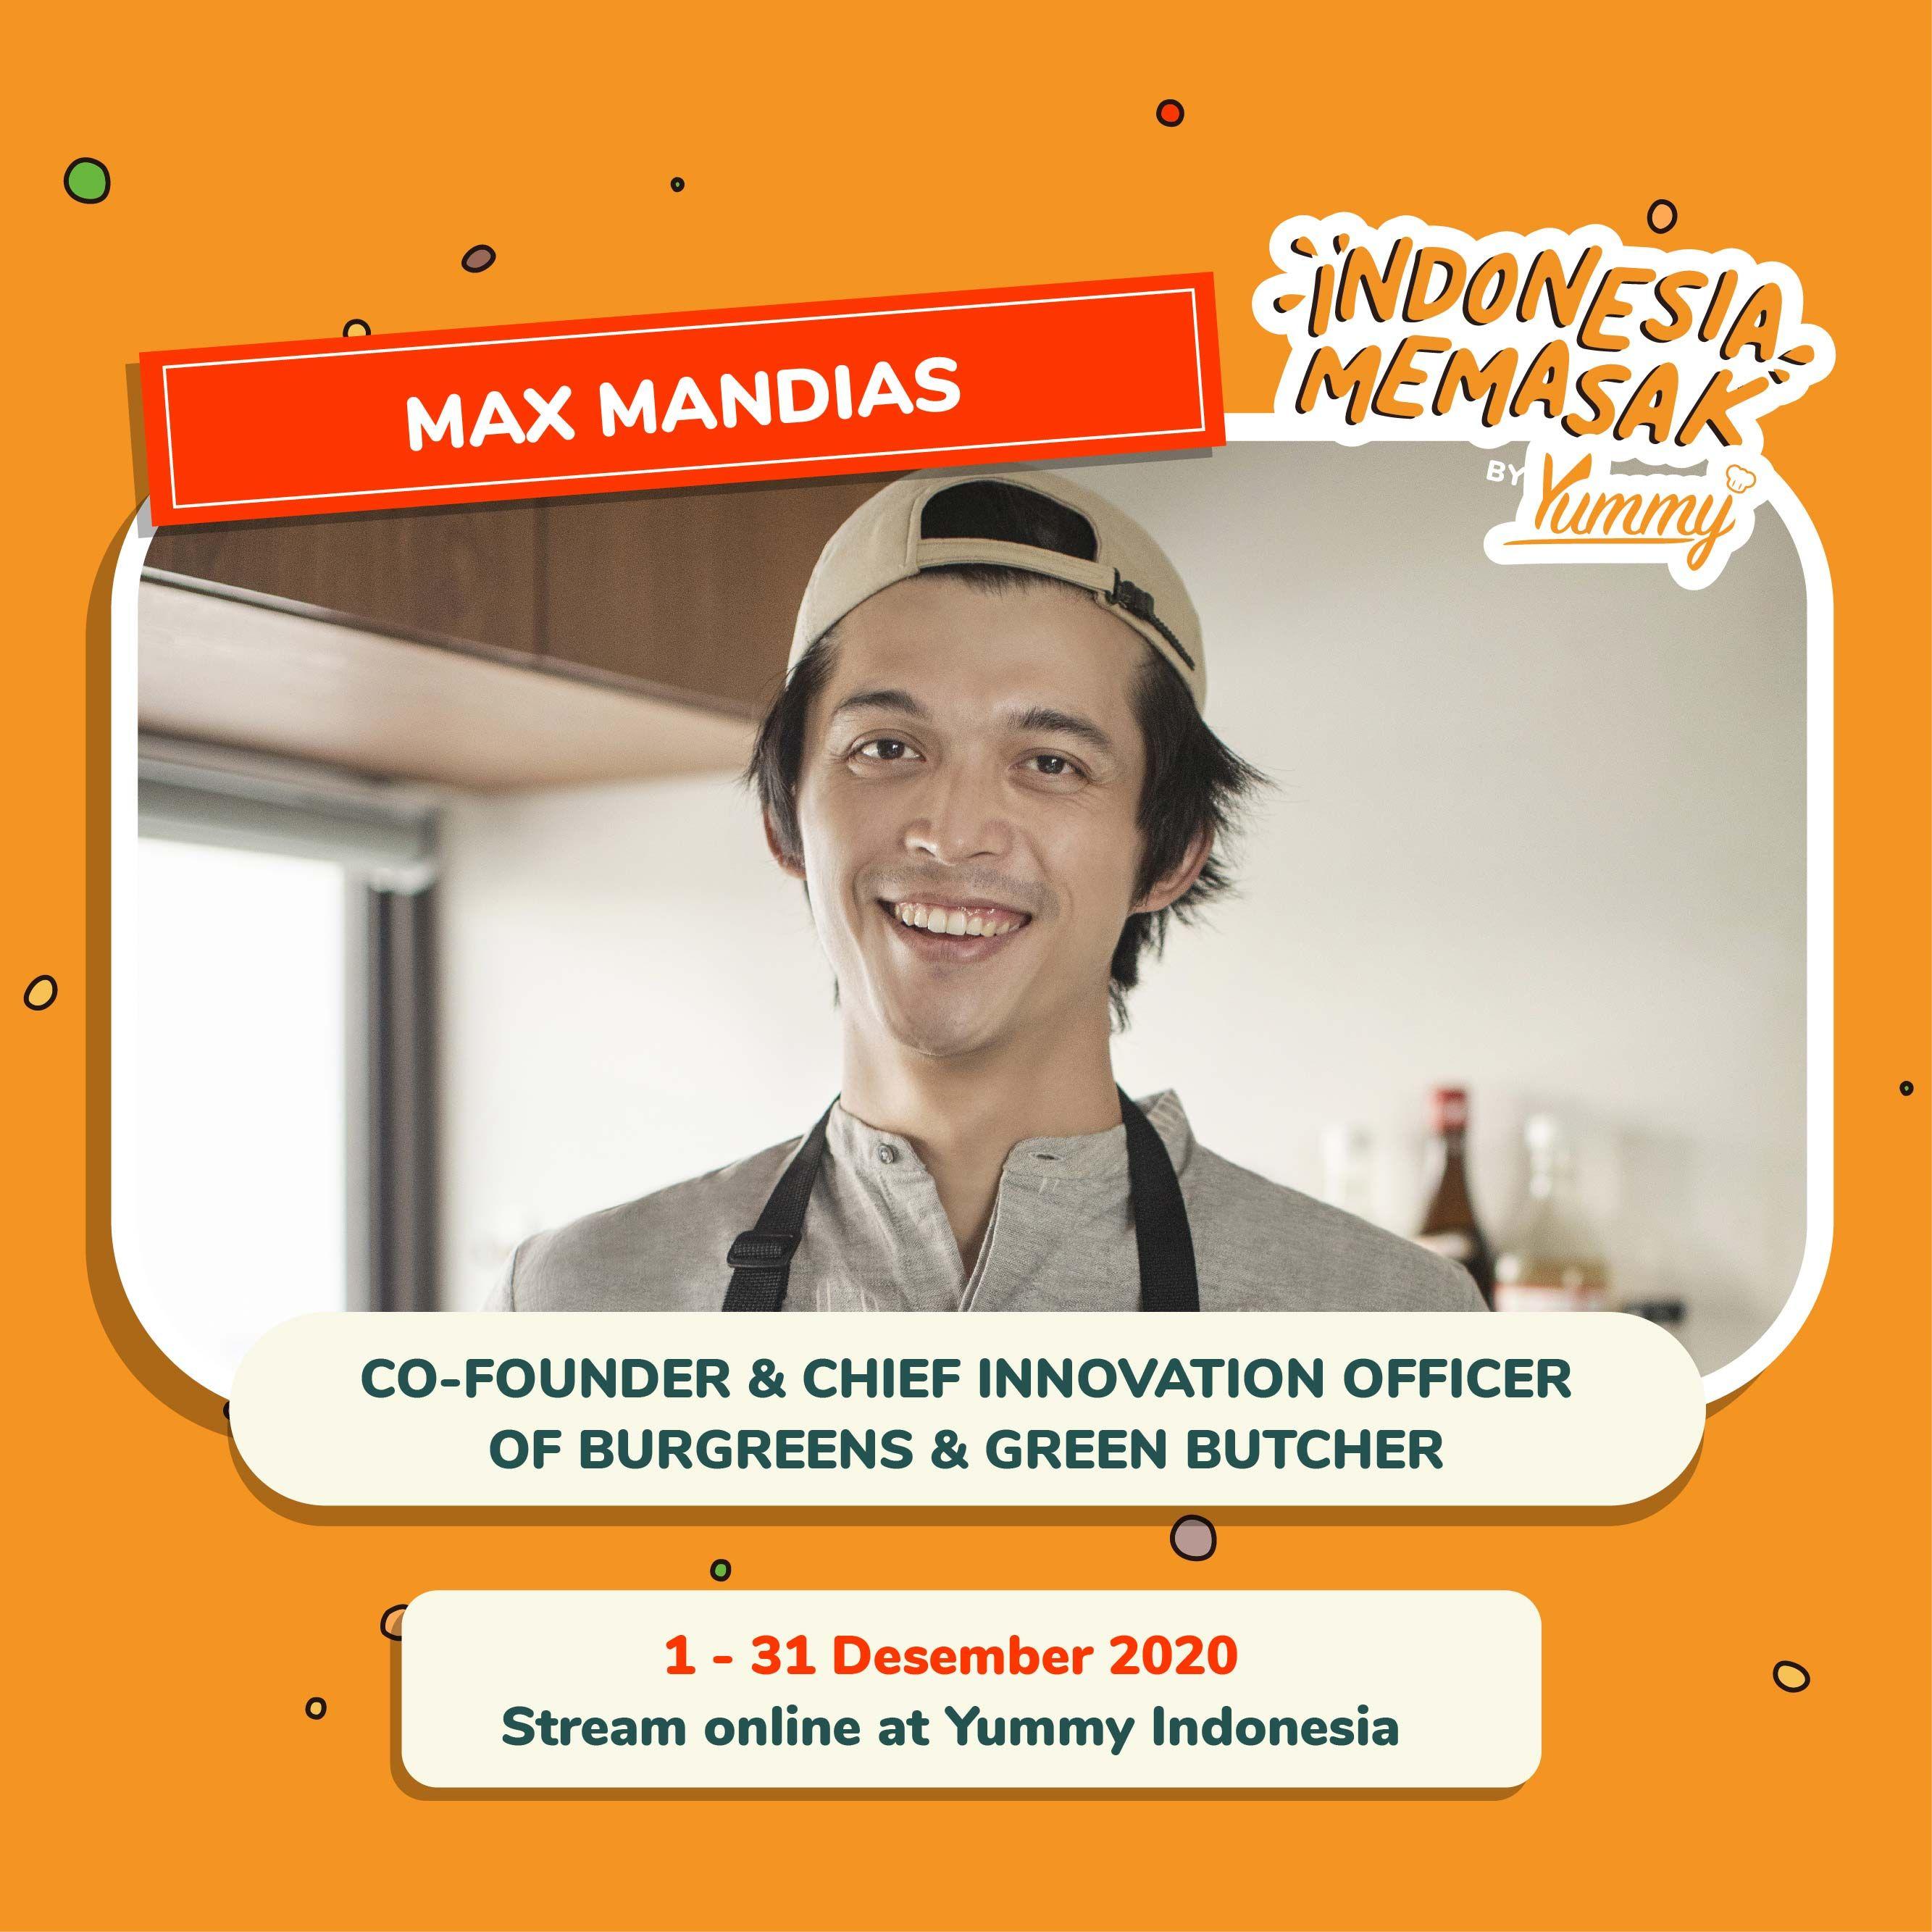 Bikin Semangat Masak, Ini Daftar Line Up Indonesia Memasak by Yummy